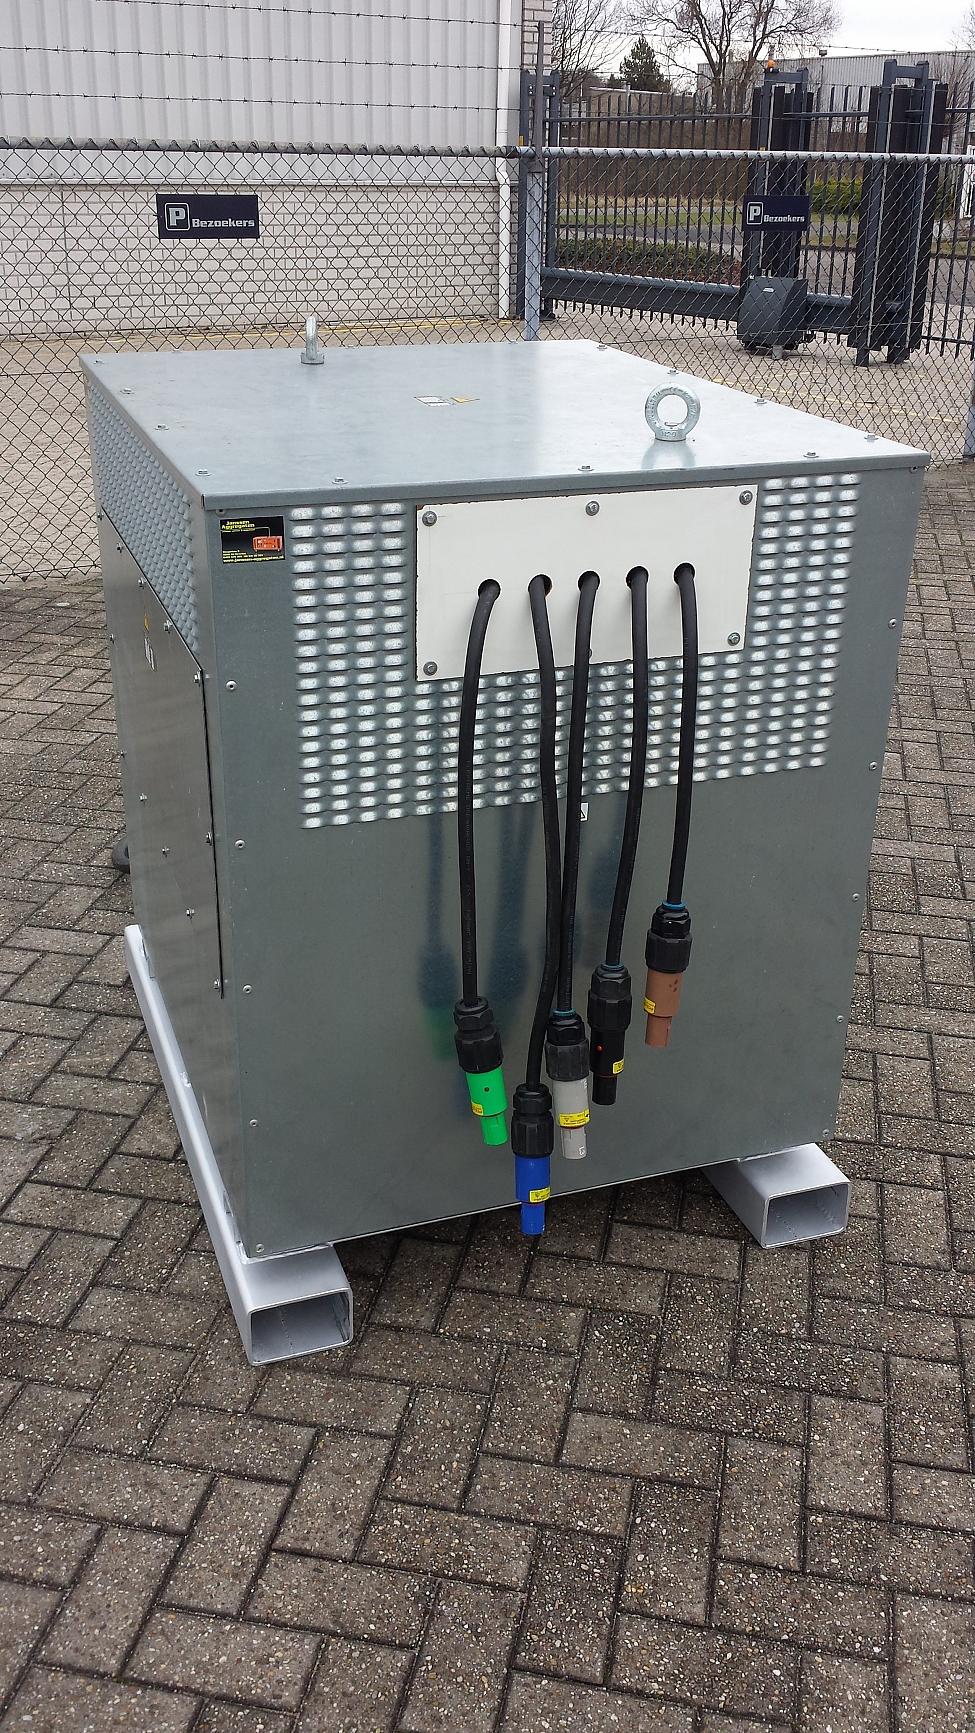 Trafo 630 kVA (ingaand 400V > uitgaand 550-690V+N)